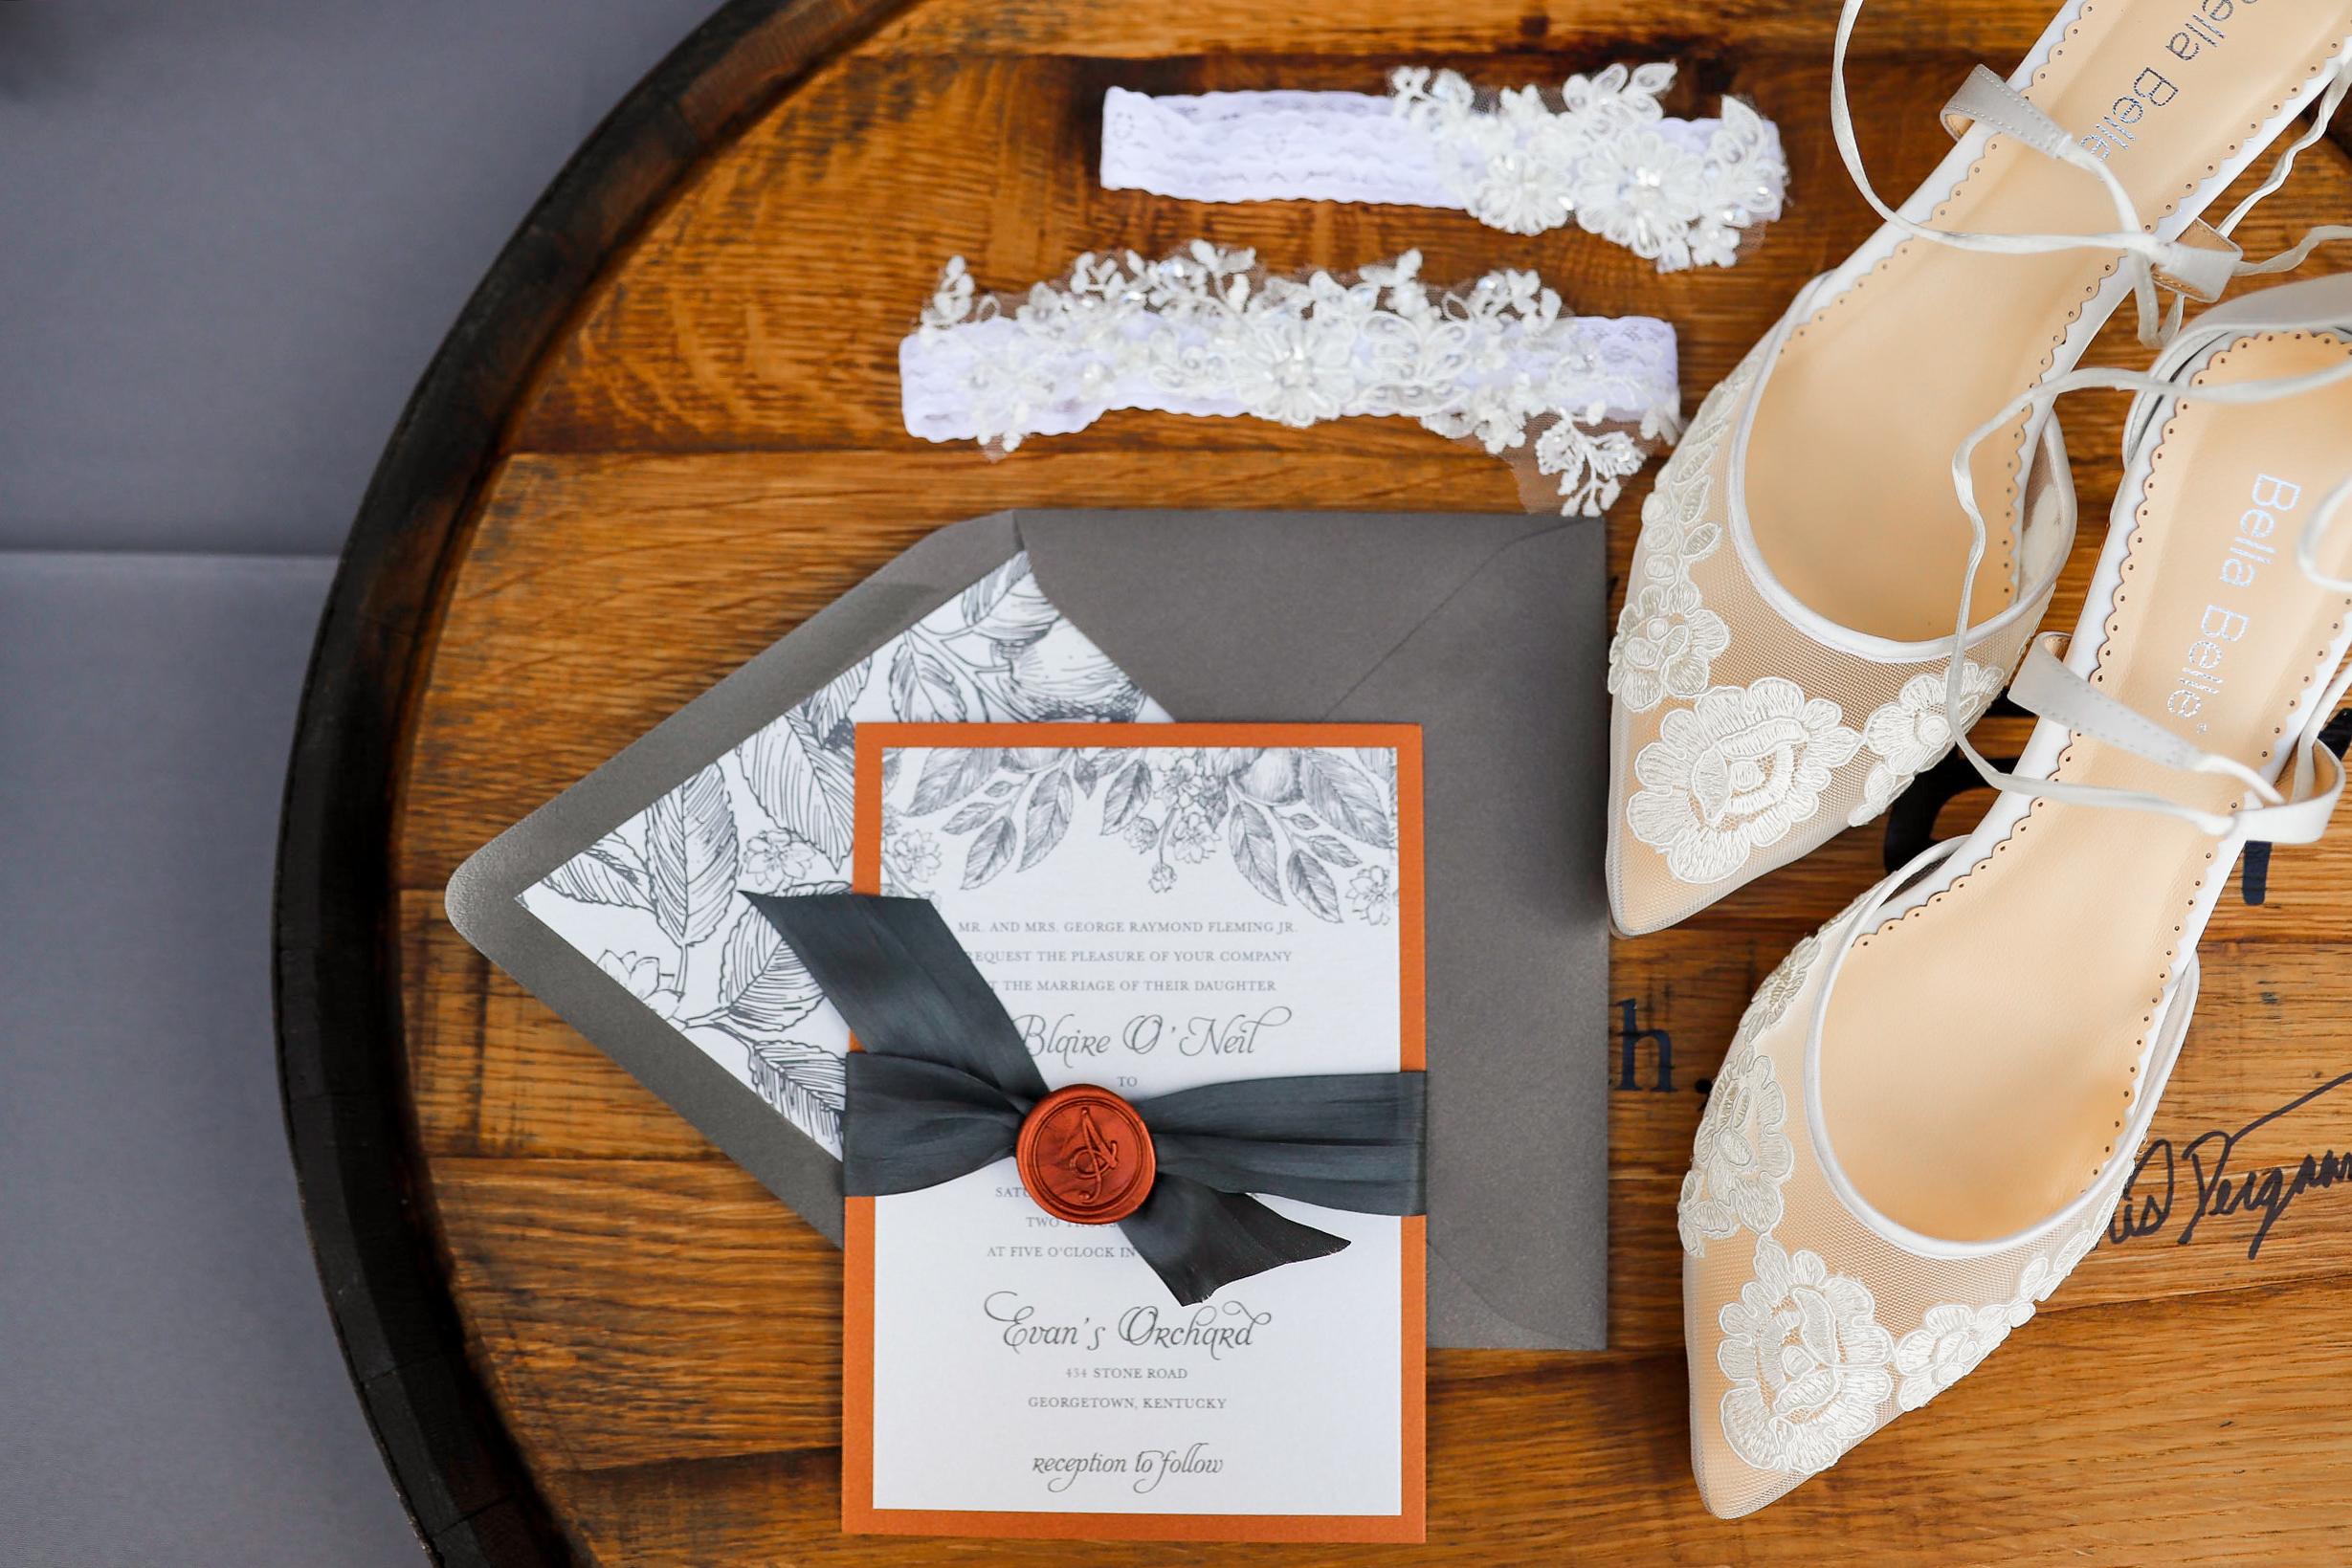 Evans-Orchard-Lexington-Kentucky-Fall-Wedding-1.jpg